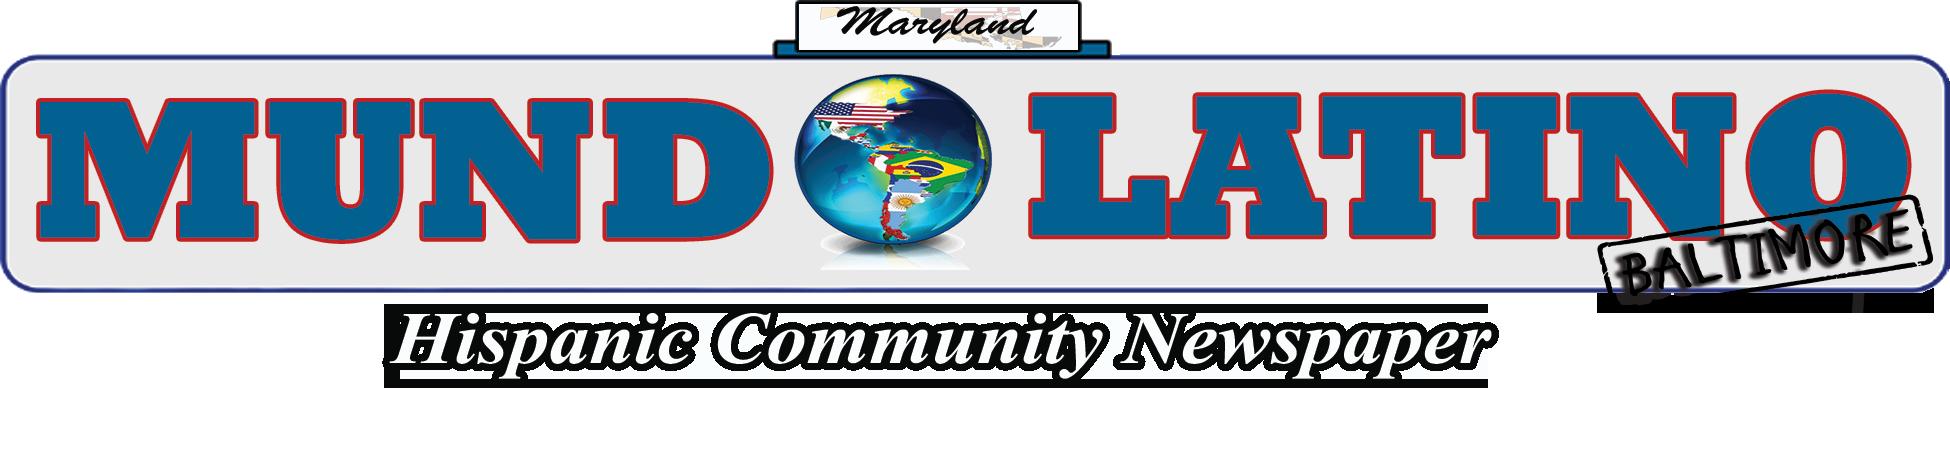 Mundo-latino-logo-nuevo-on-layer-logo-2016.png